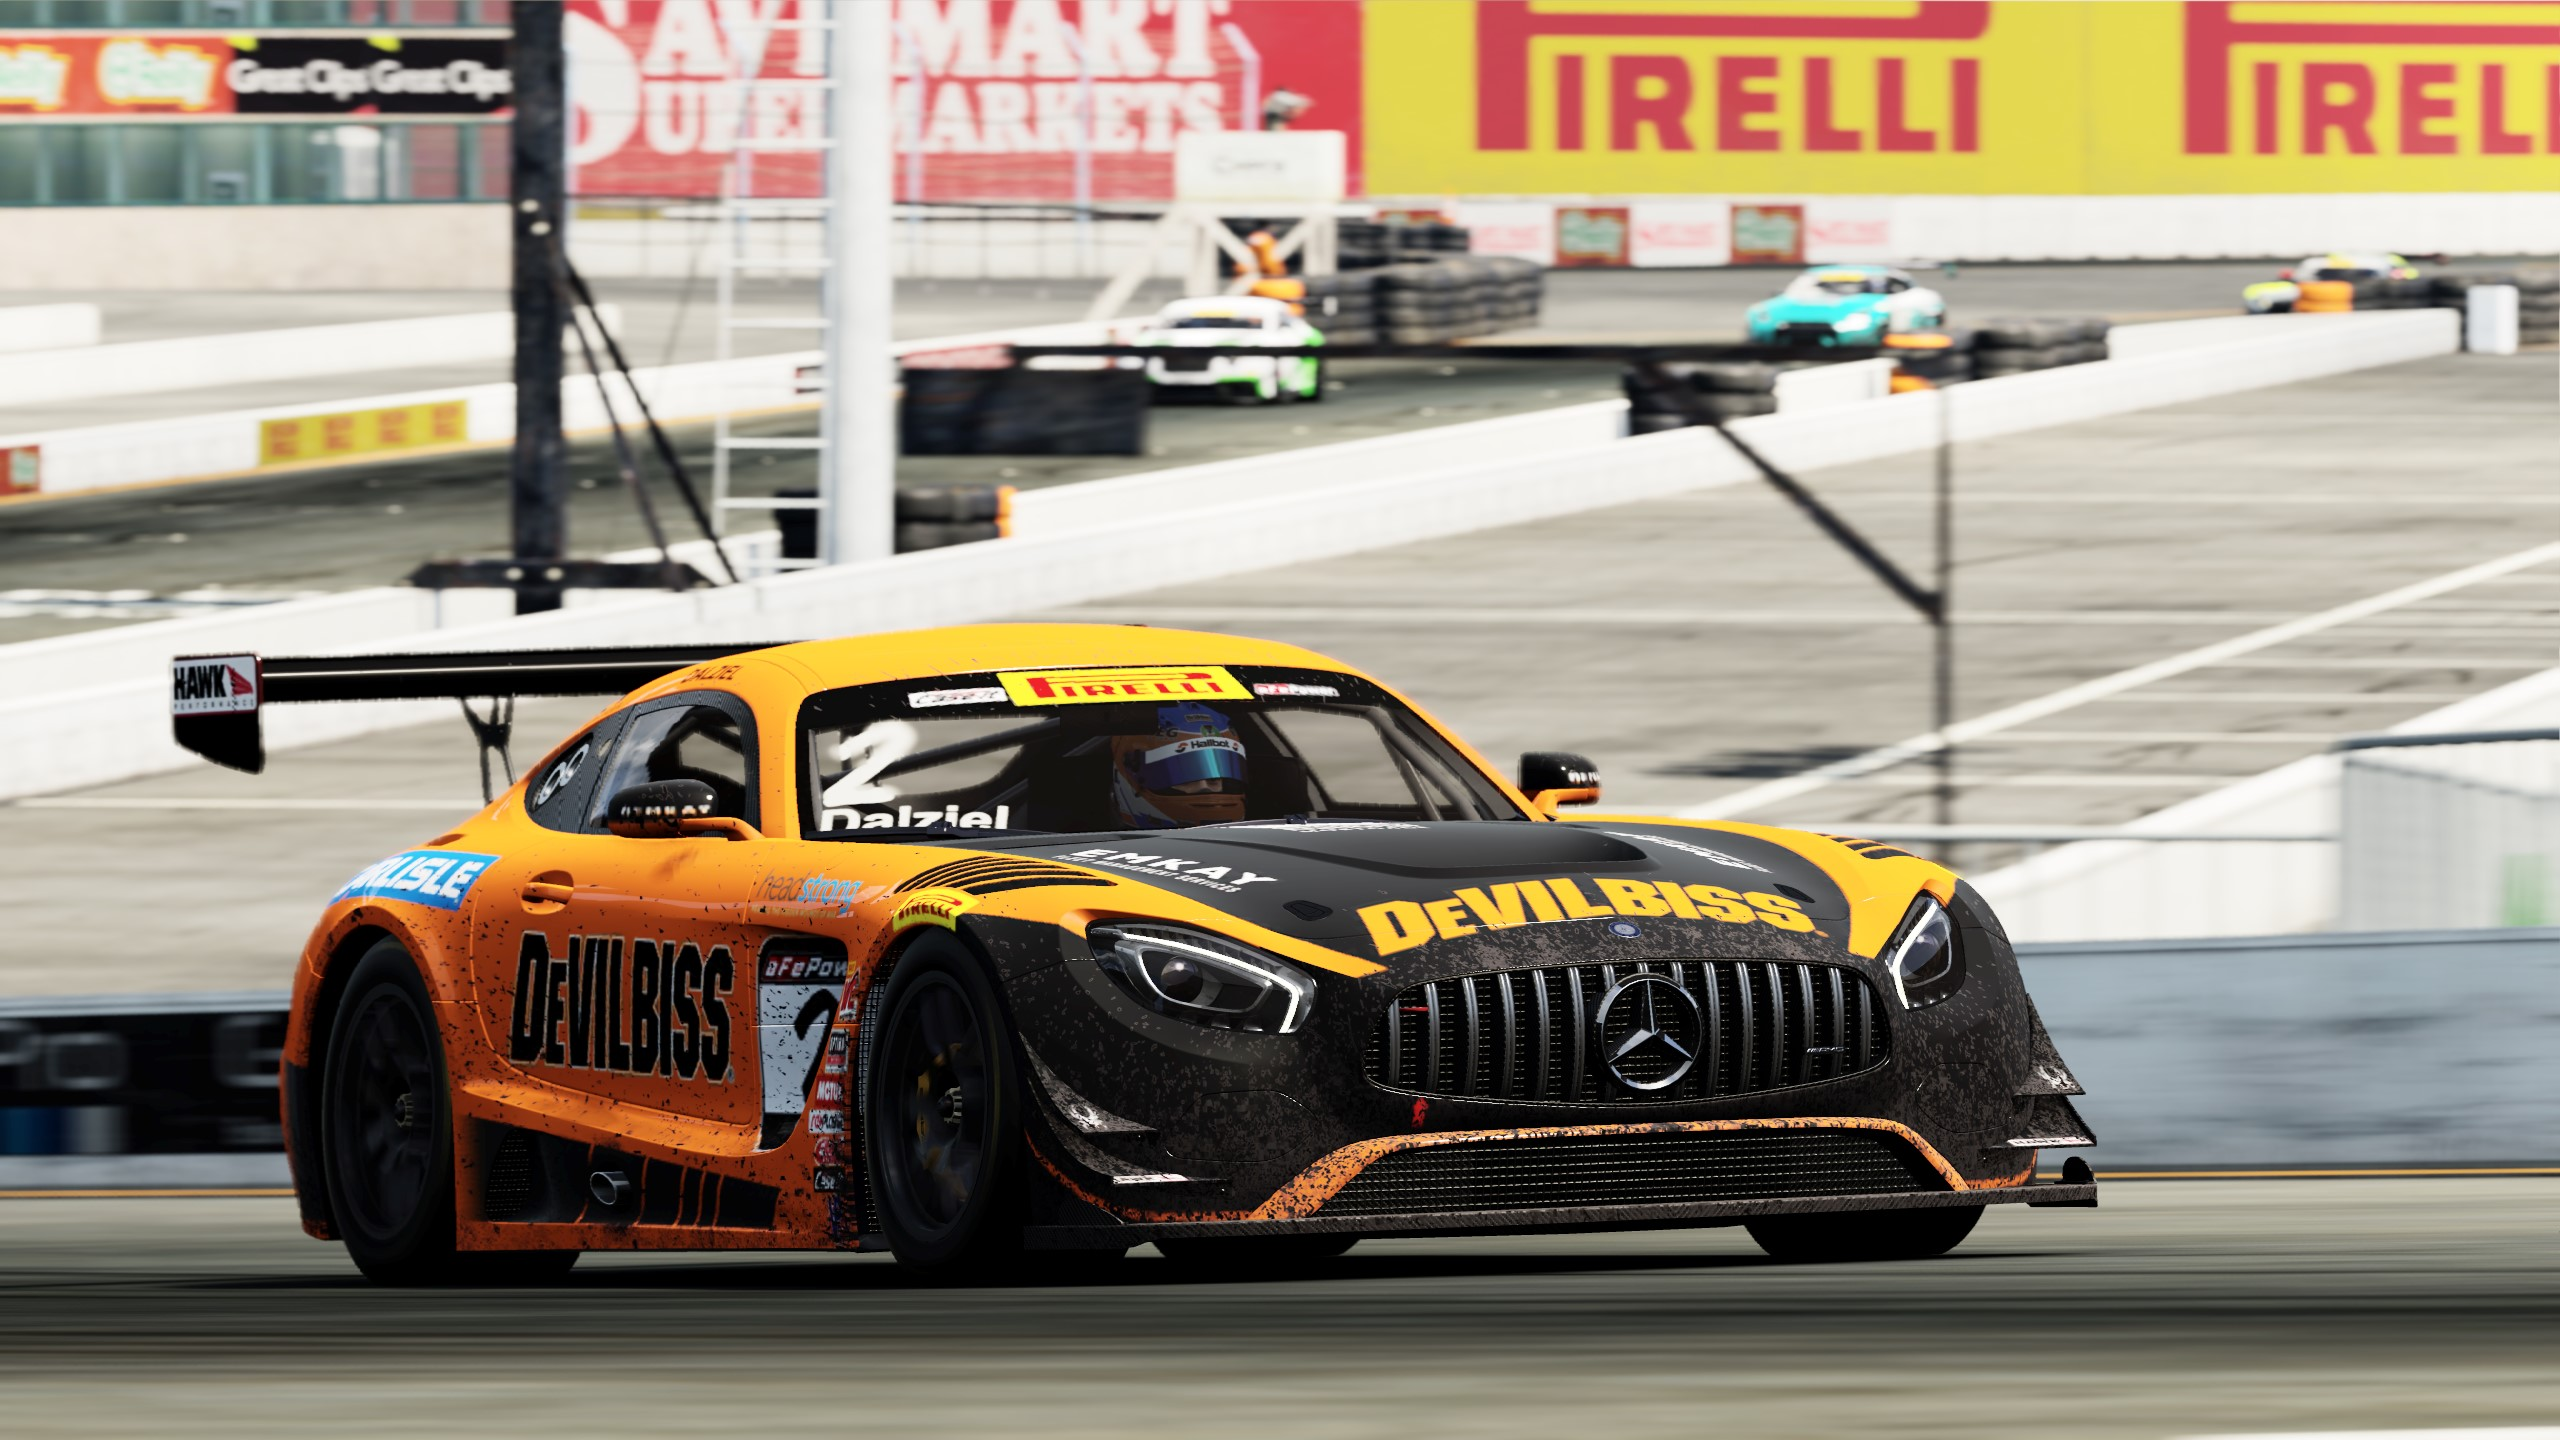 Pirelli - Project Cars 2